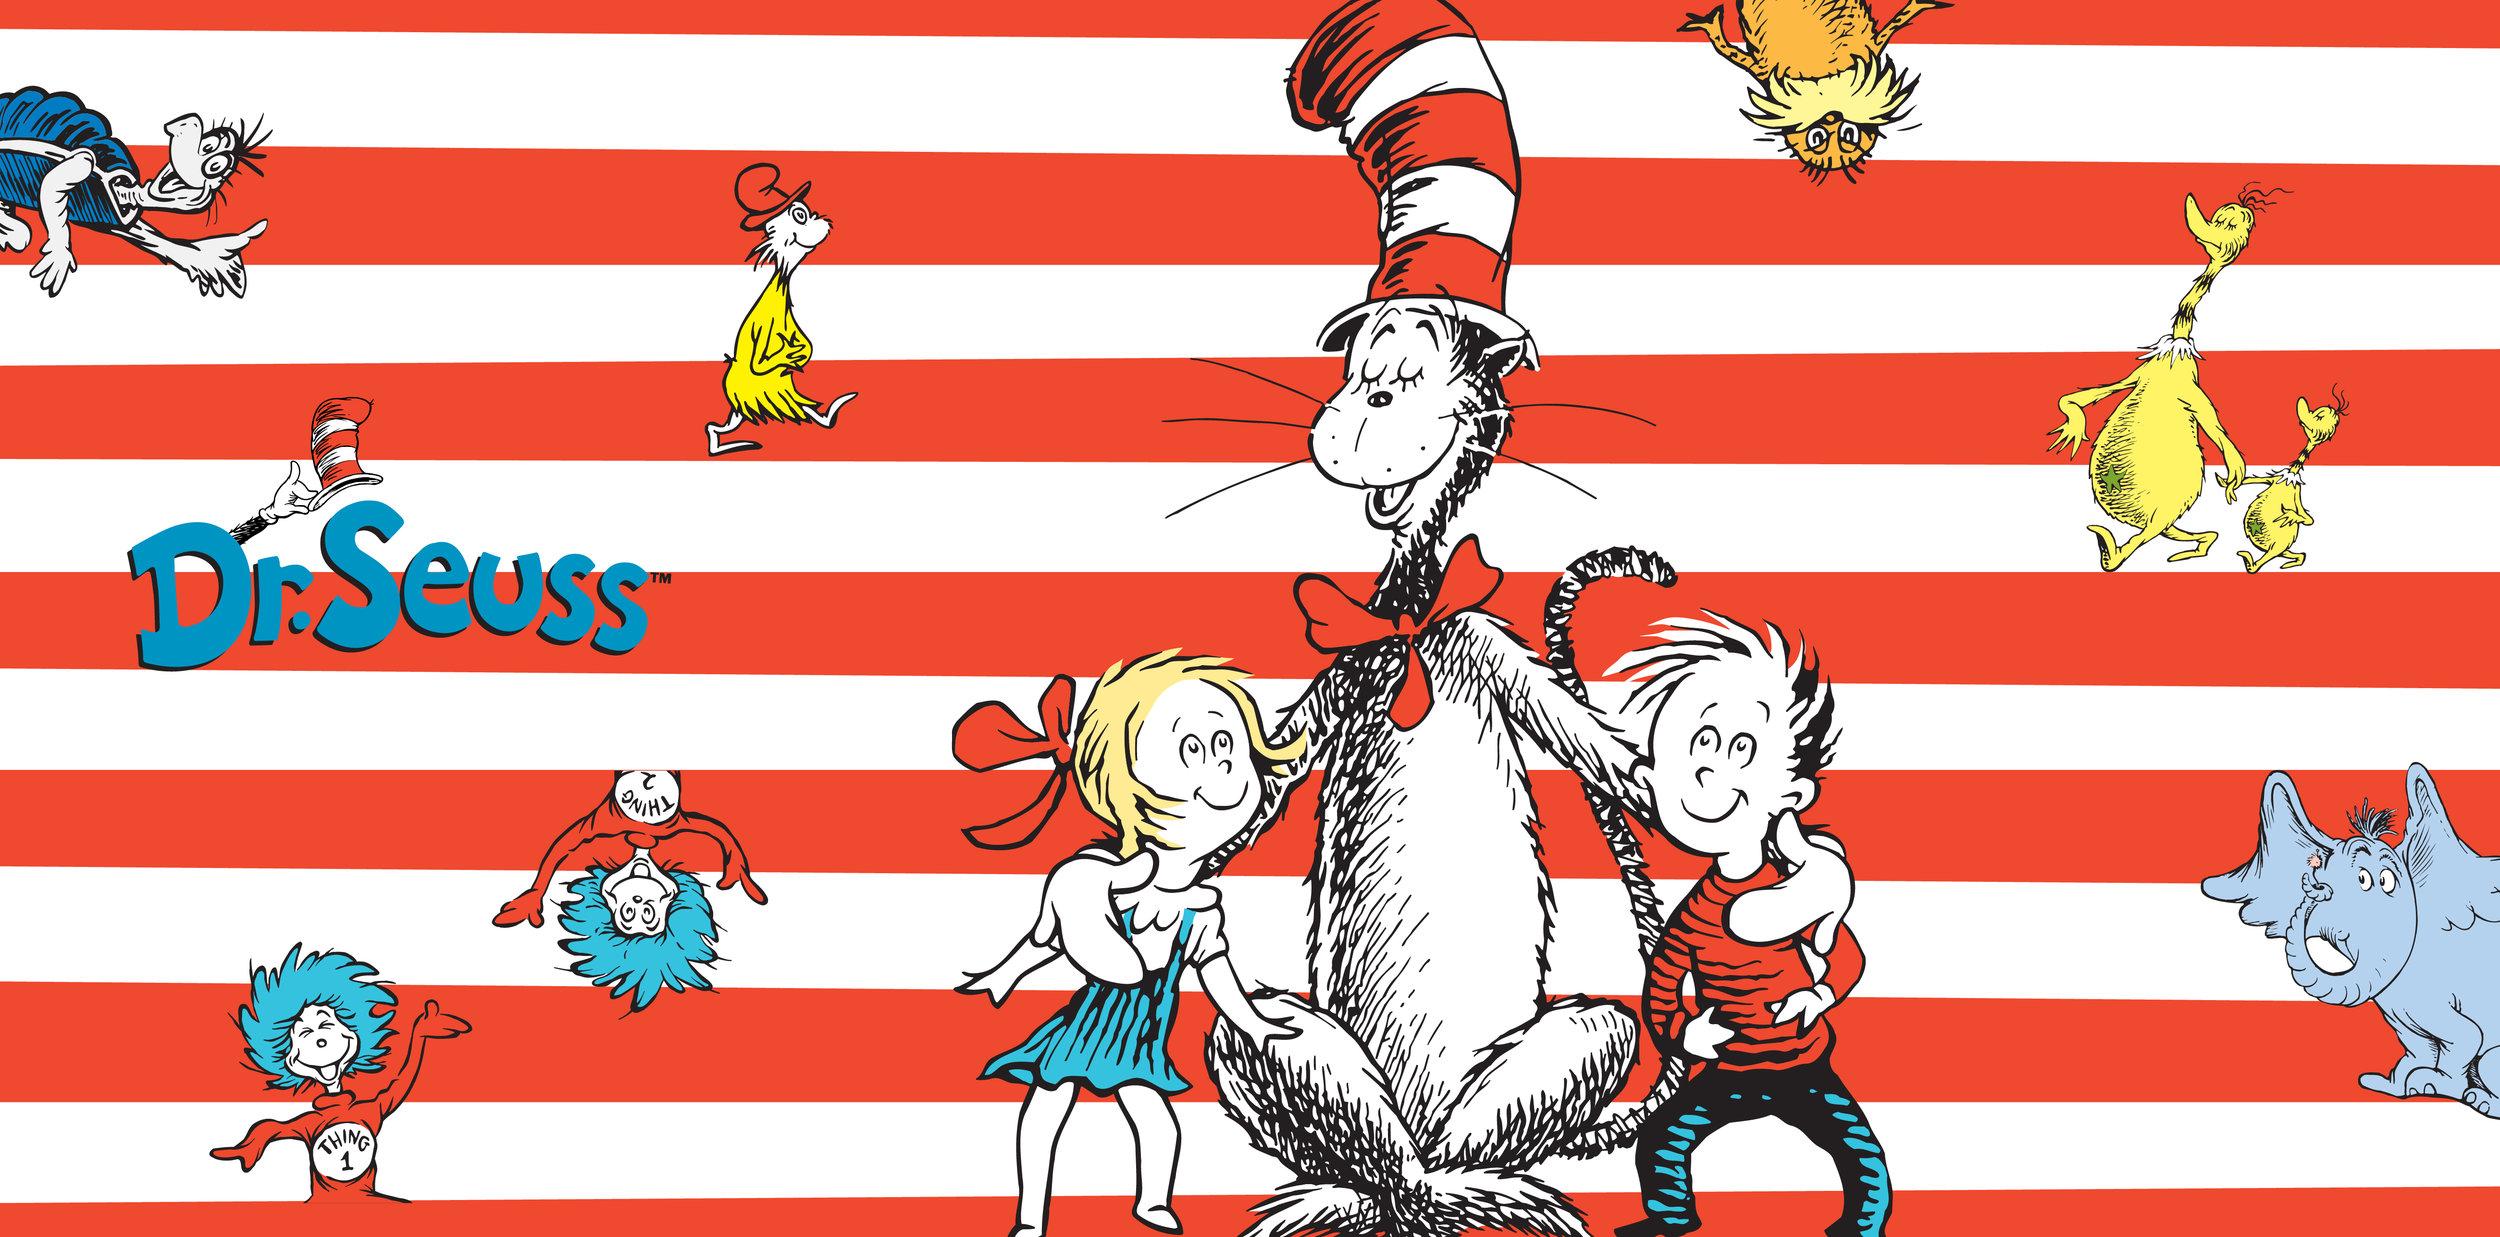 Dr Seuss Banner.jpg